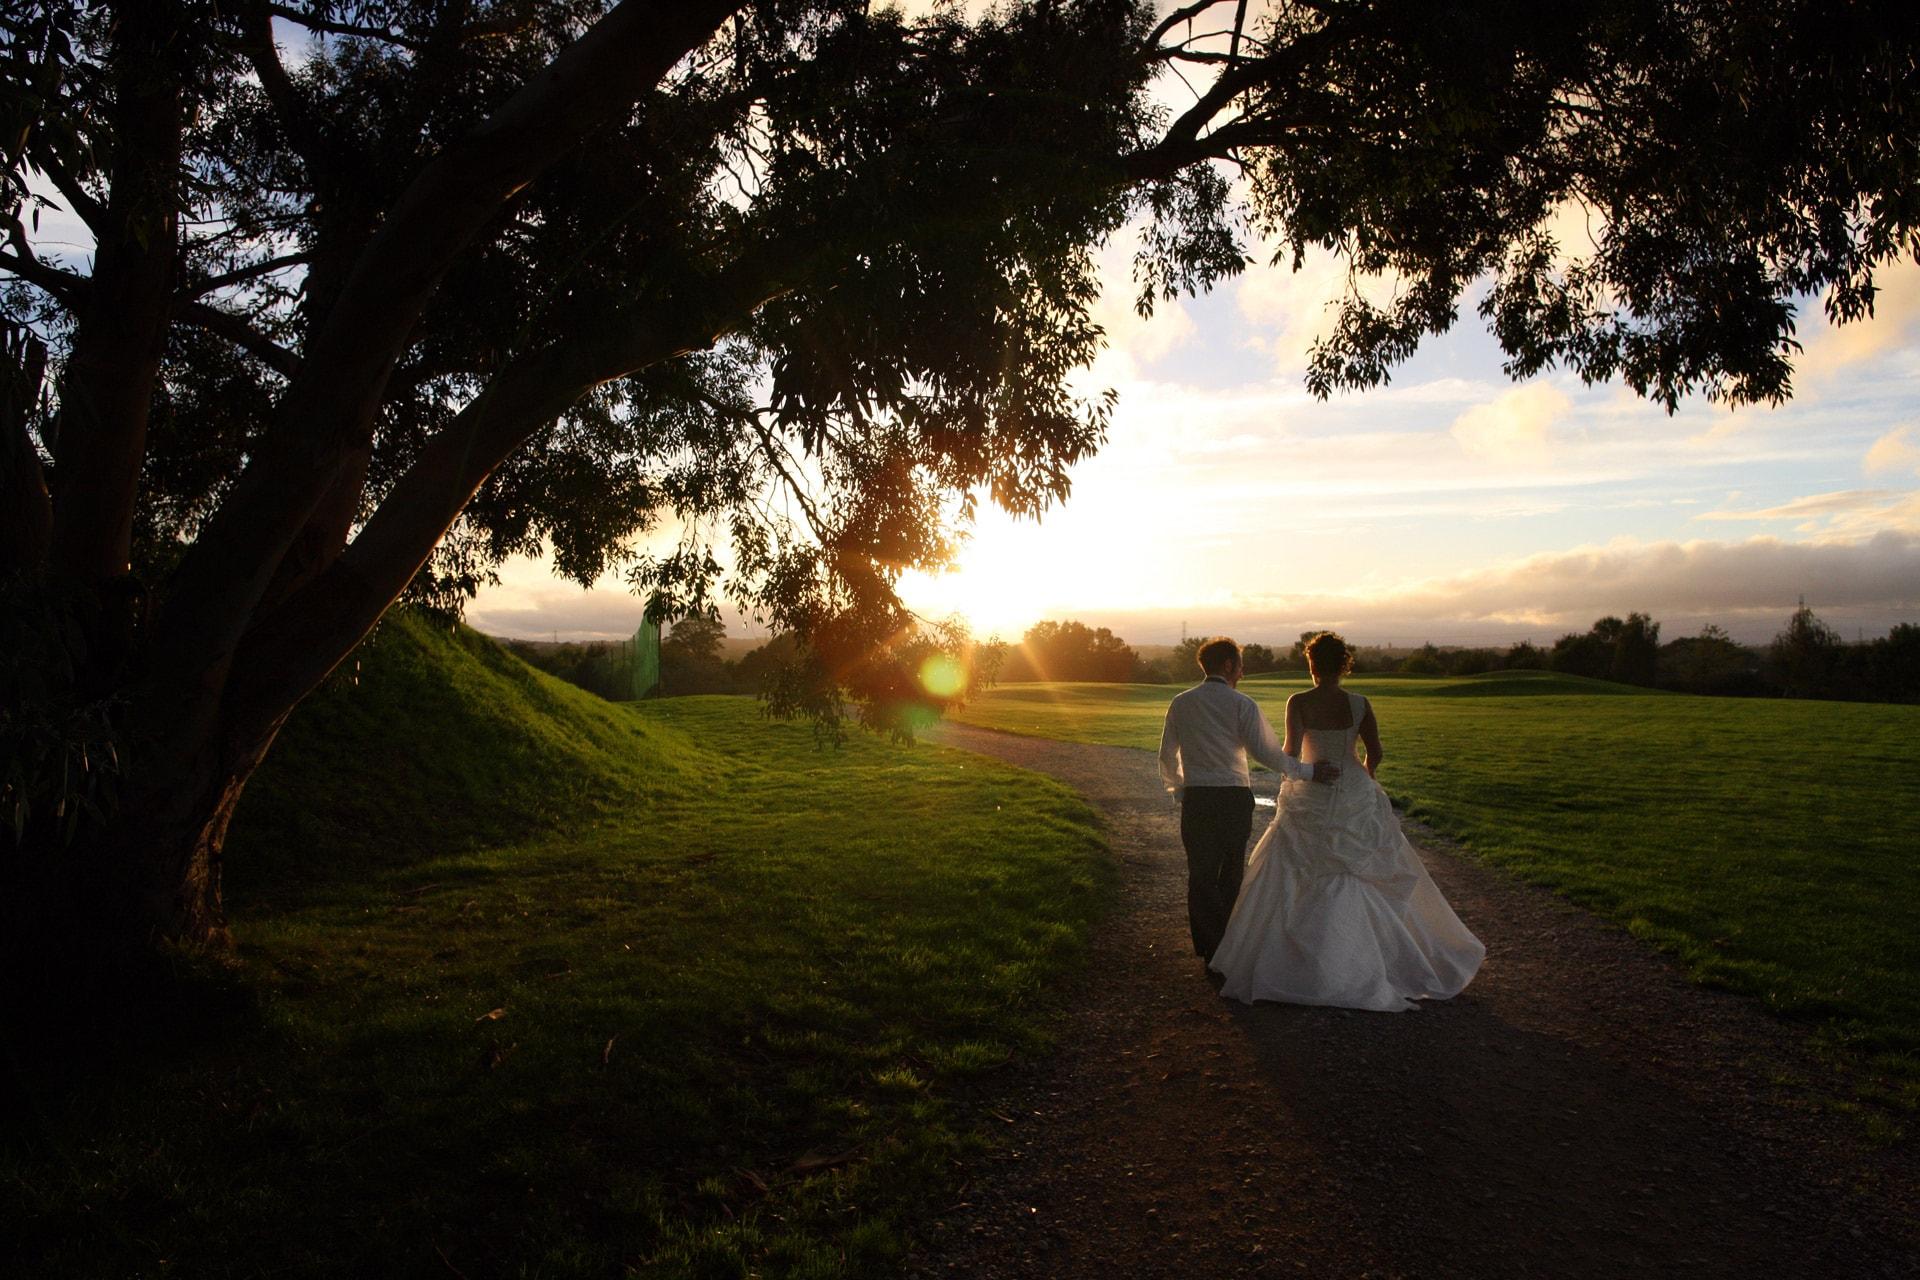 bride-groom-walk-at-sunset